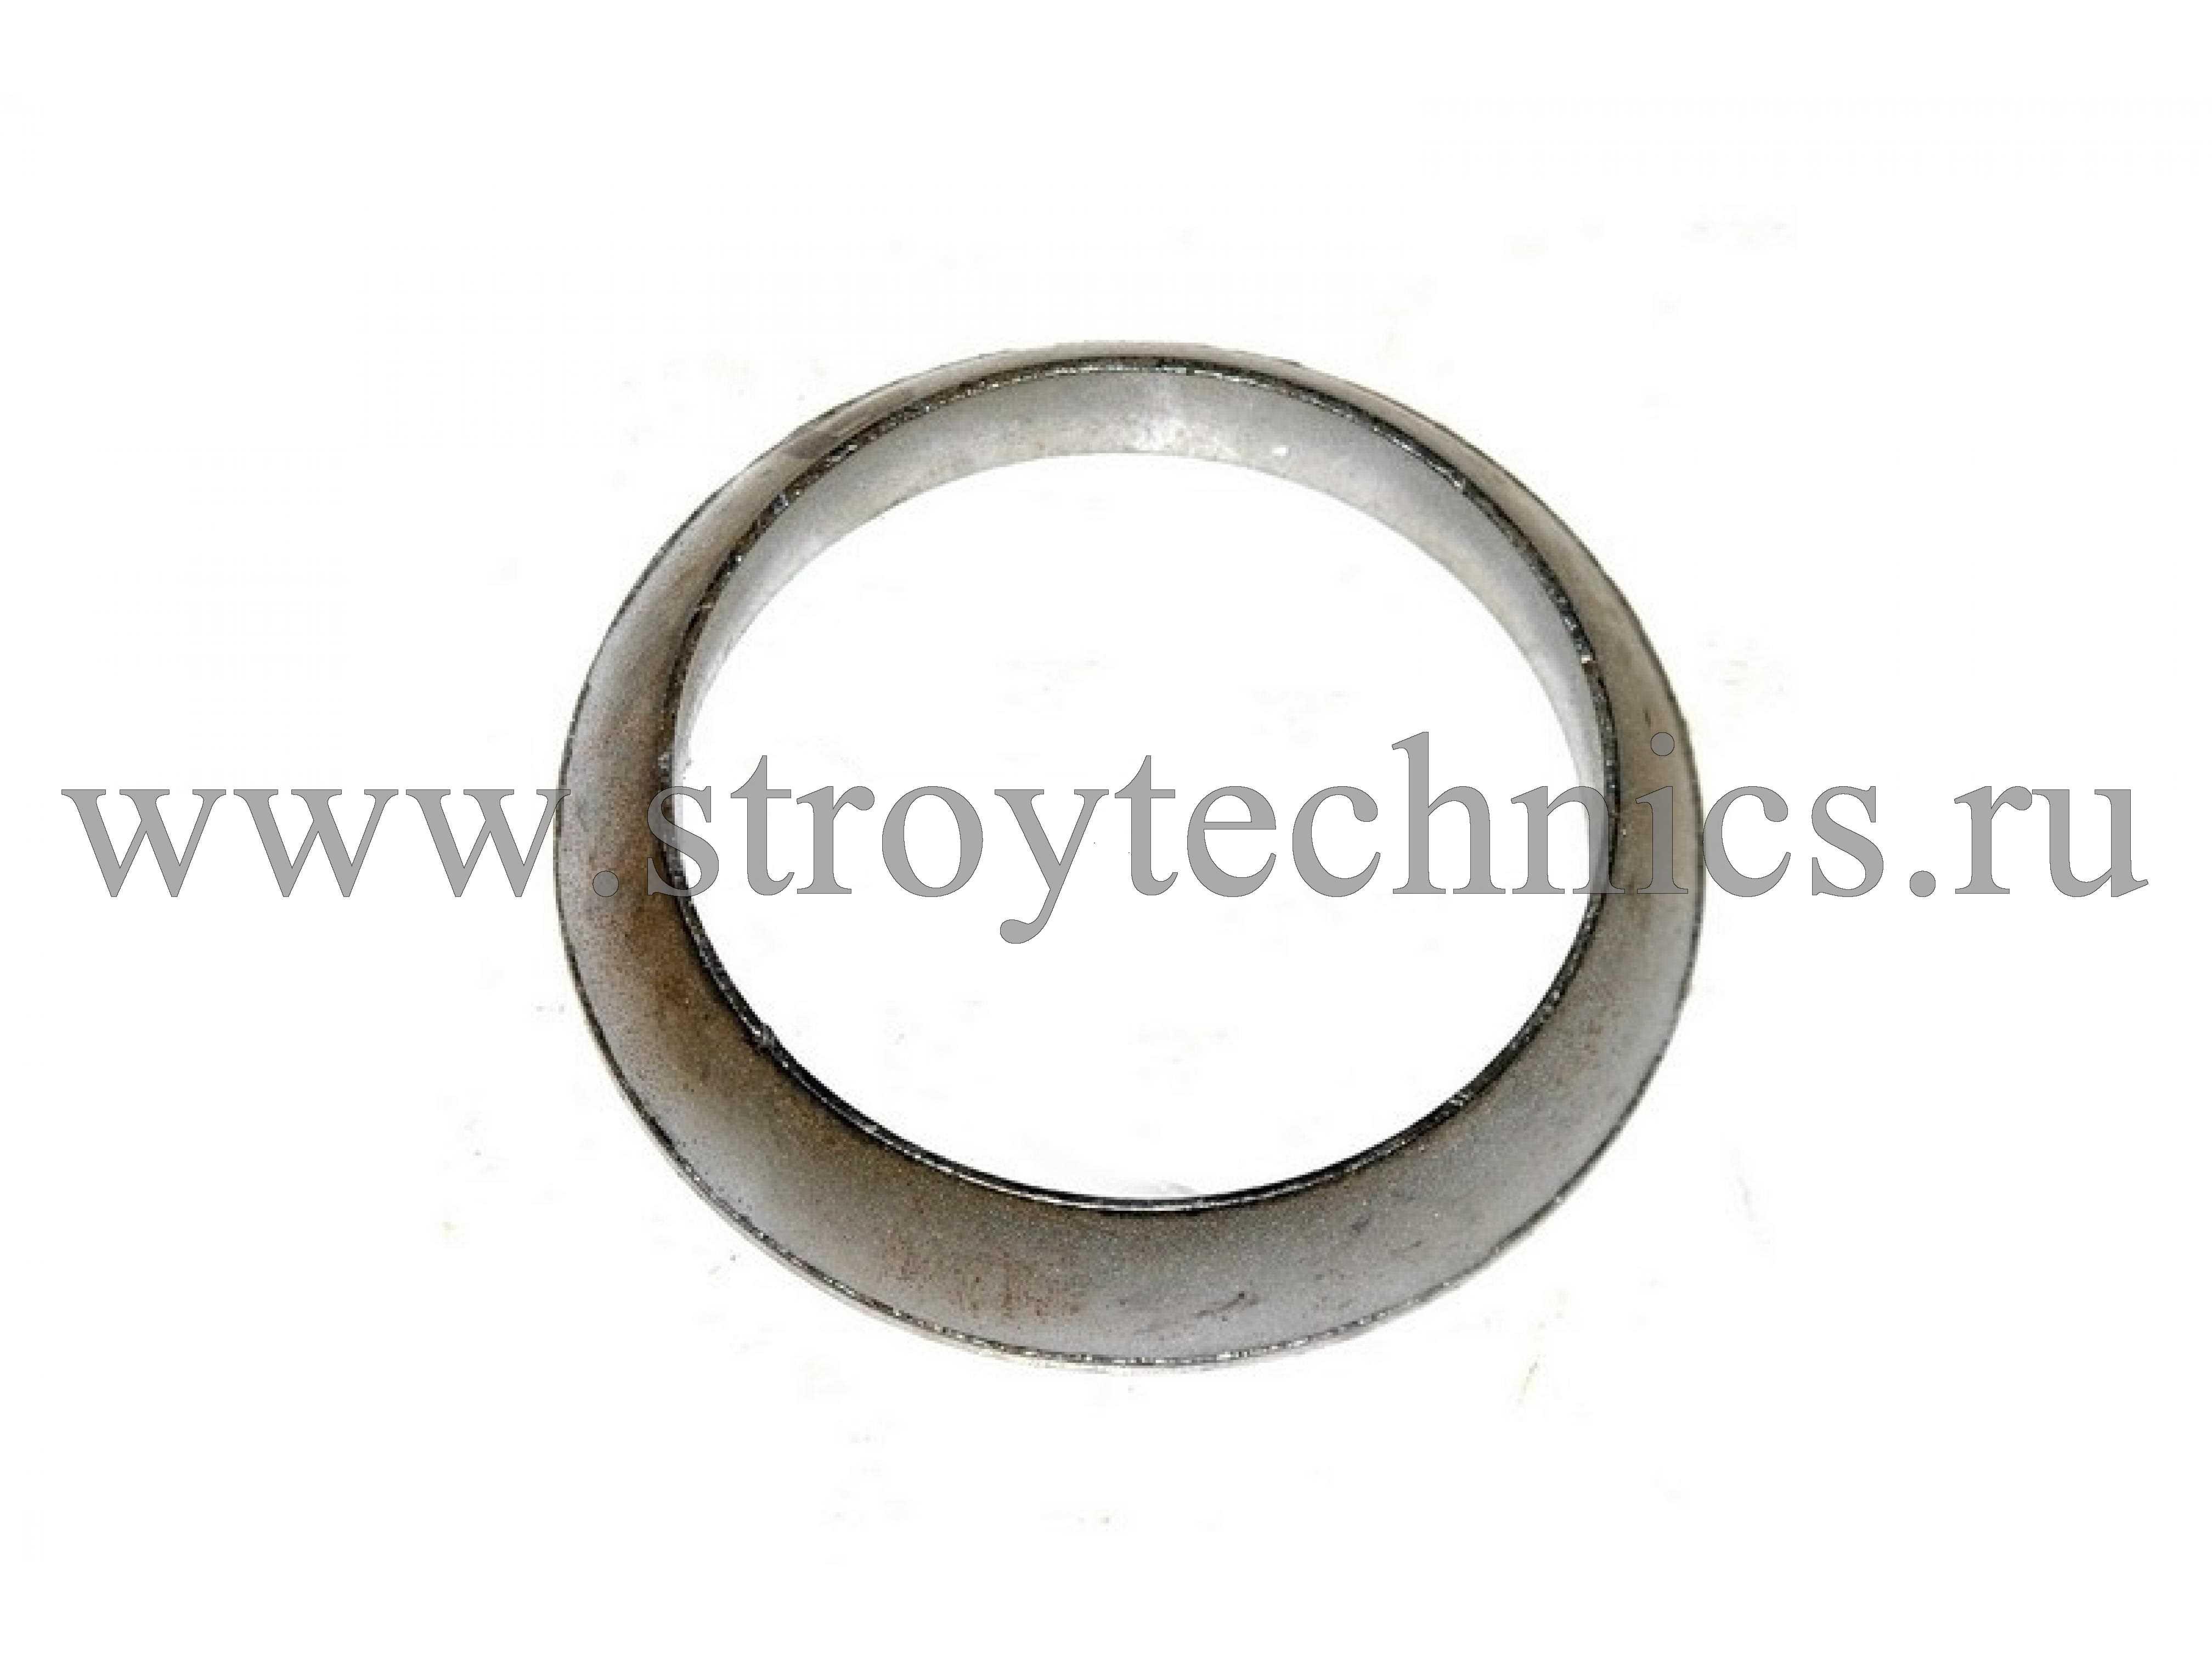 Кольцо нейтрализатора ГАЗ-3302 дв.405, 406